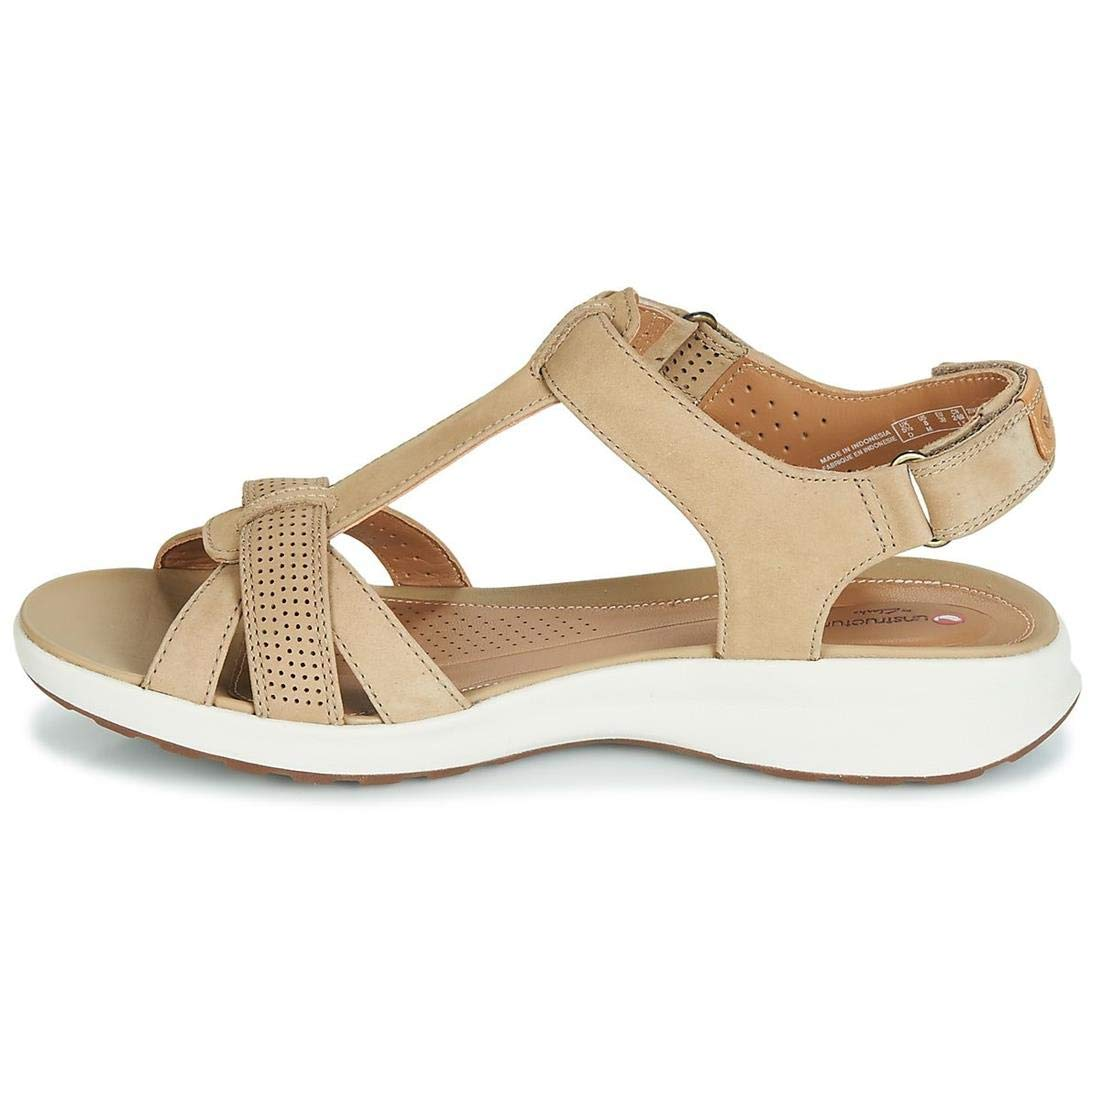 a49251a53f2e Clarks Ladies Unstructured Strappy Sandals Un Adorn Vibe  Amazon.co.uk   Shoes   Bags